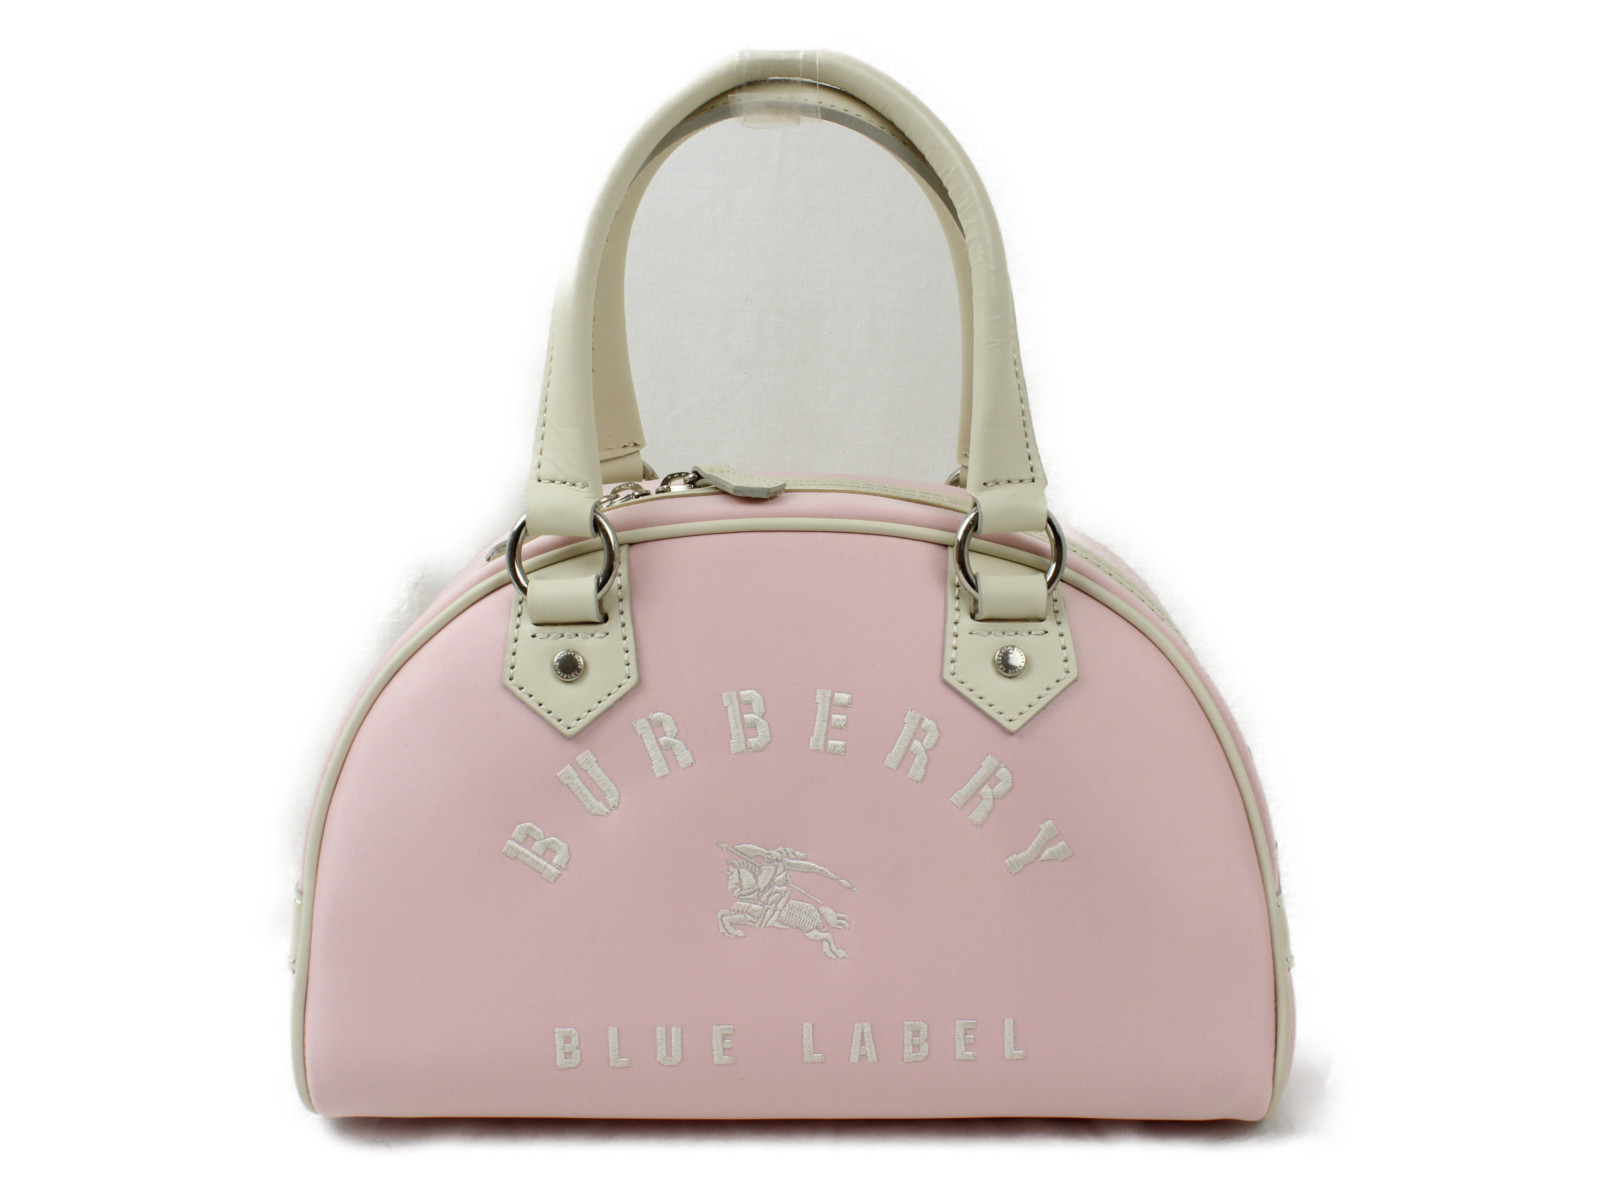 BURBERRY バーバリーミニボストンバッグ BLUE LABELハンドバッグ ピンク/白 ナイロン/レザープレゼント包装可 【中古】